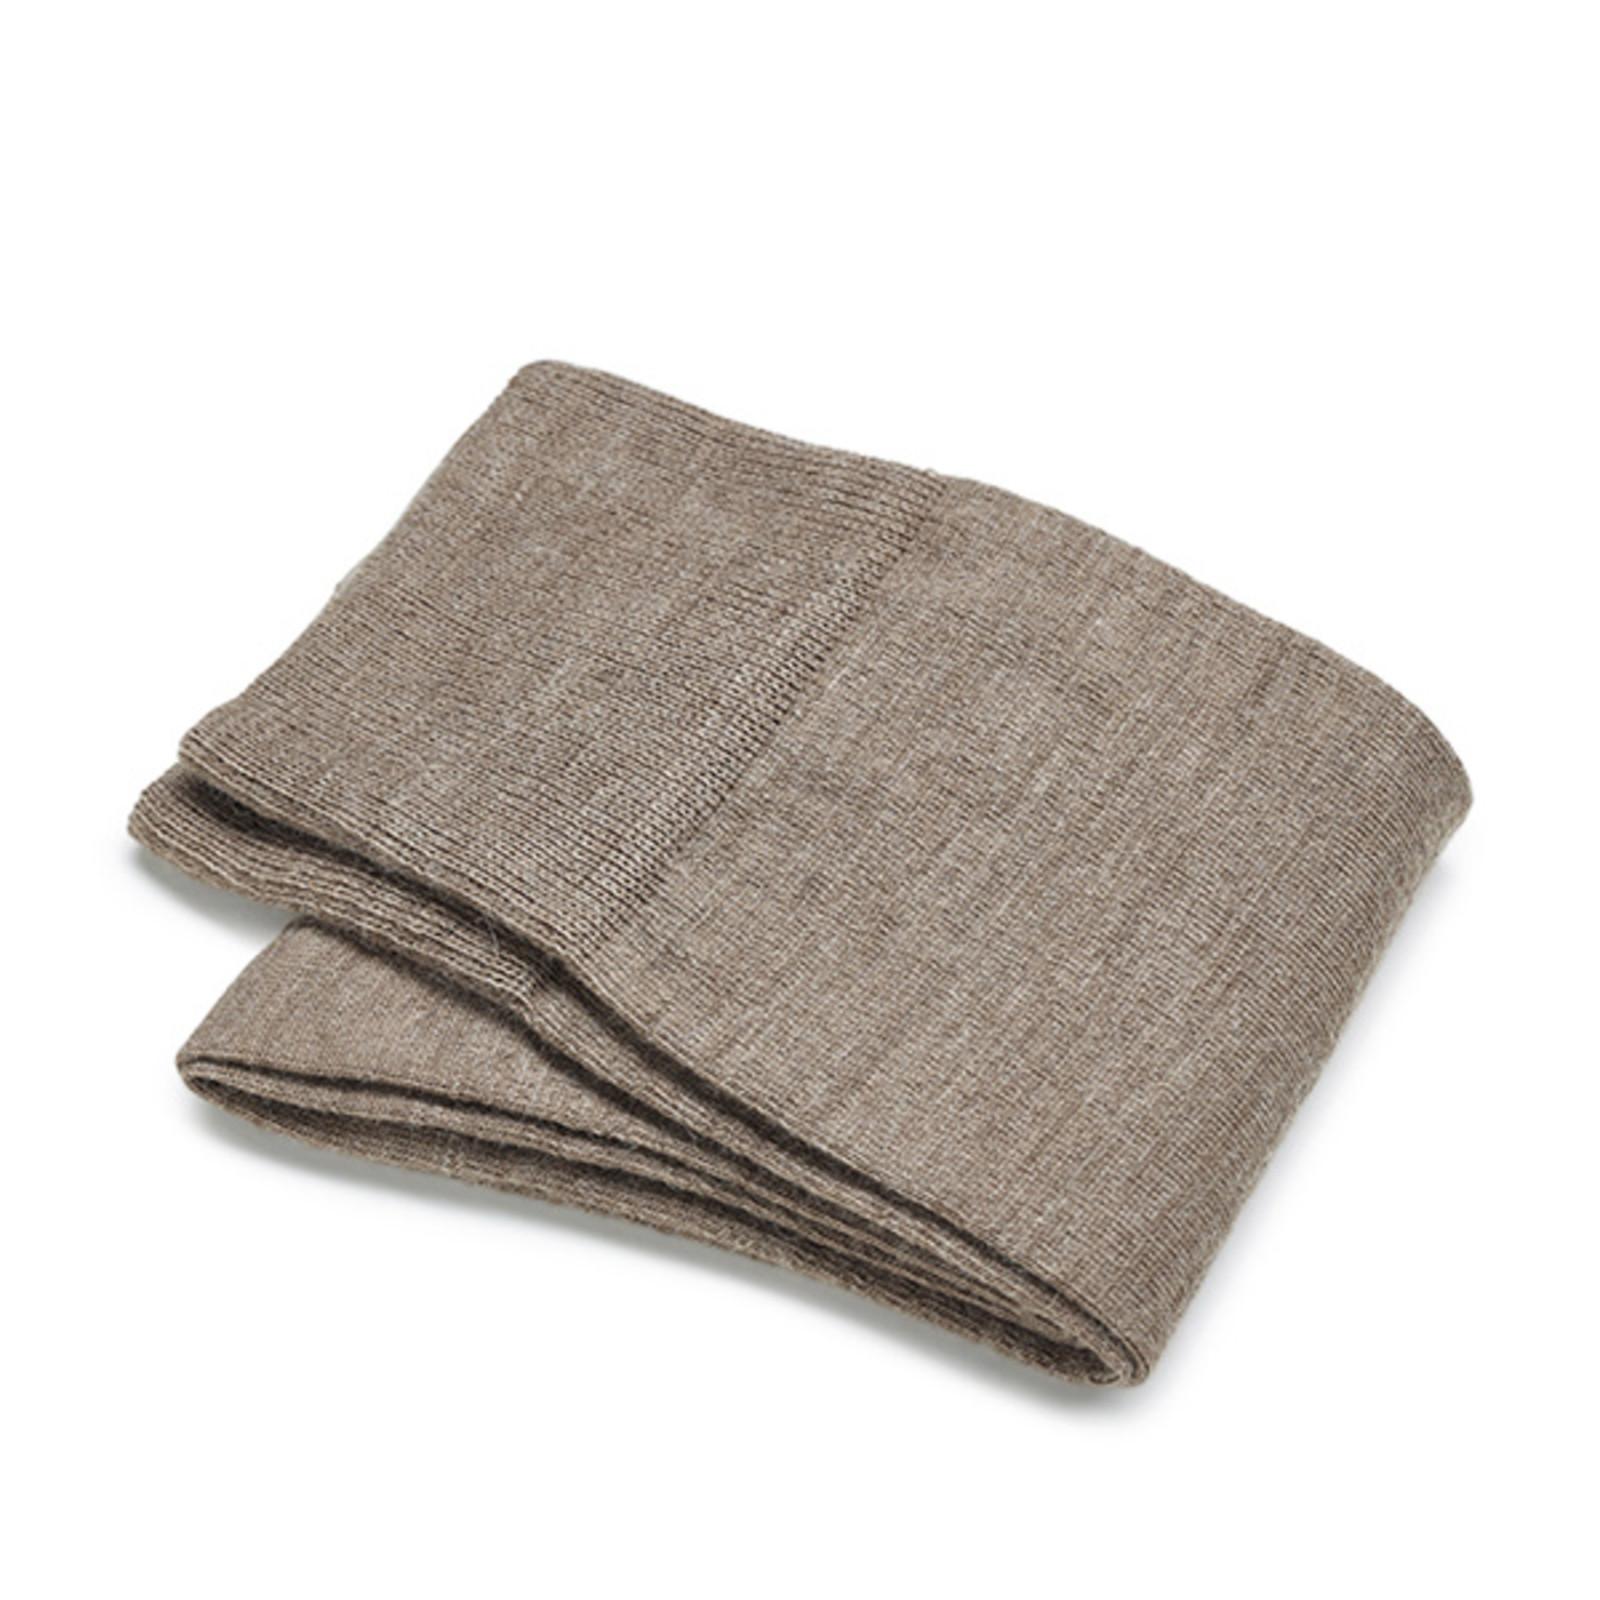 Carlo Lanza Kaki Merino Wolle Socken